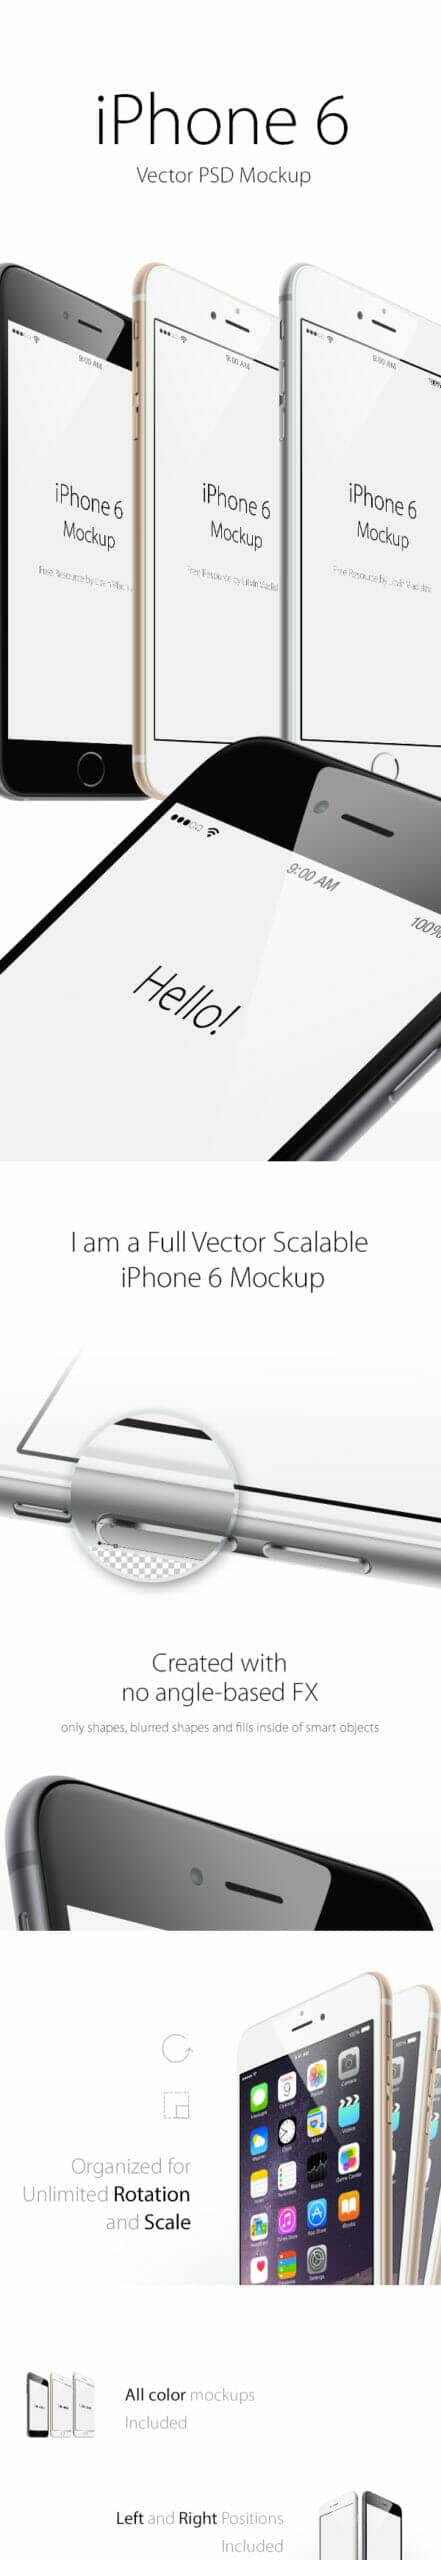 iPhone 6 Plus Angle View Mockup